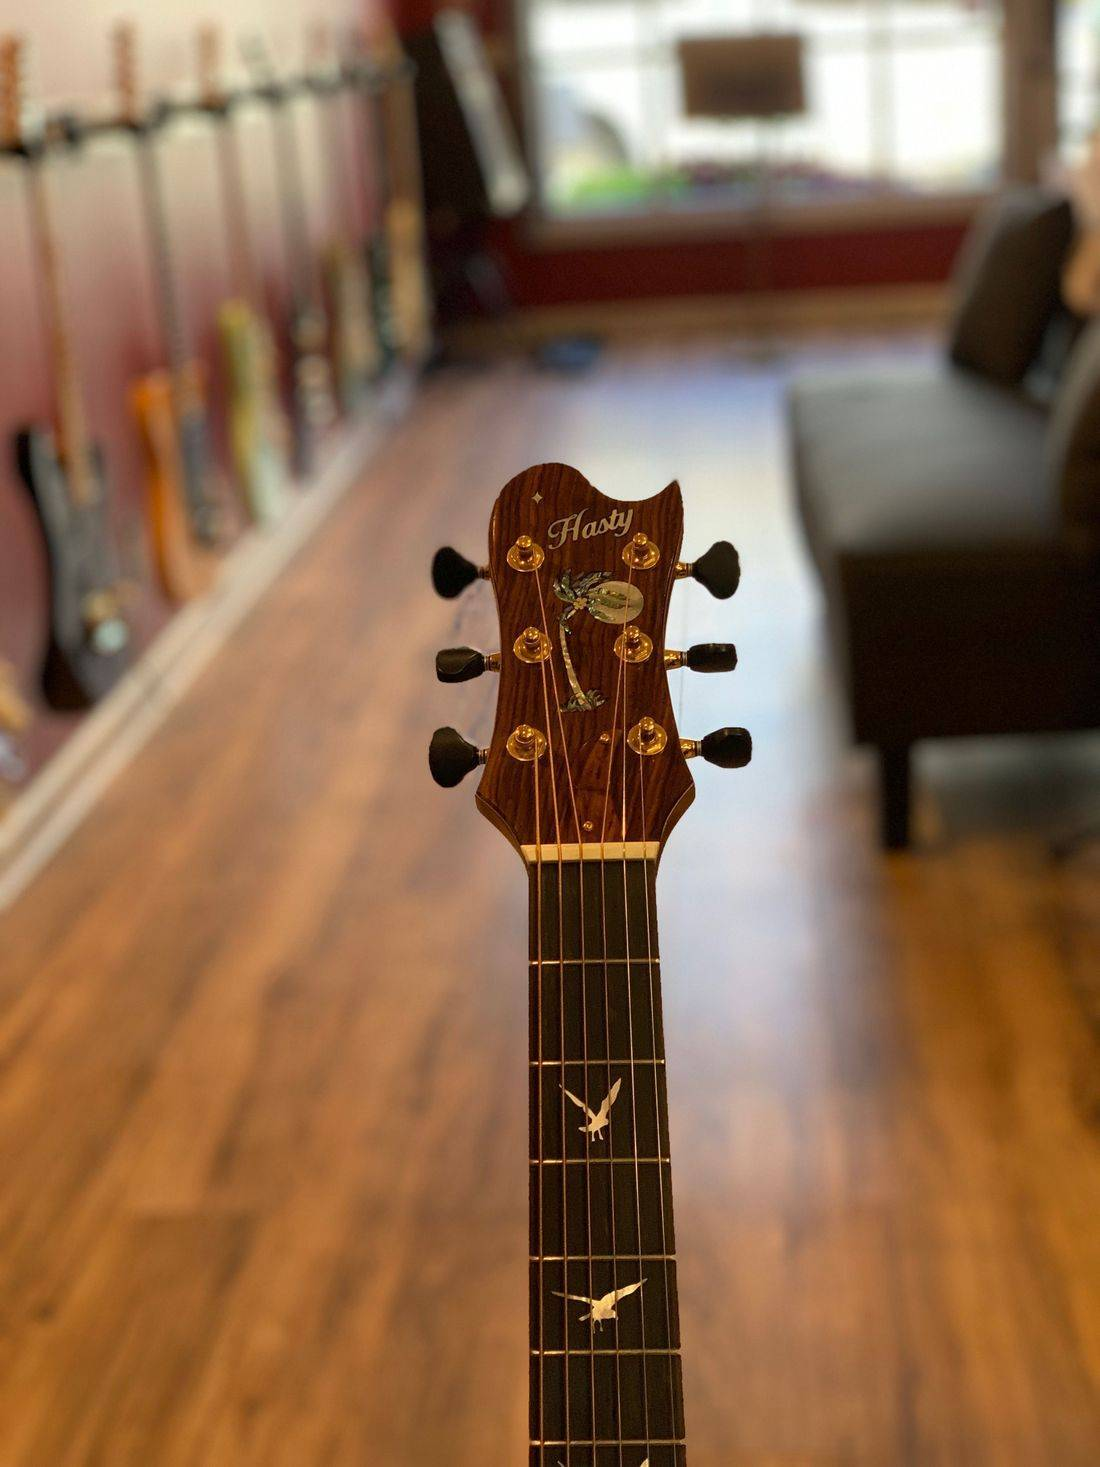 Hasty Guitar